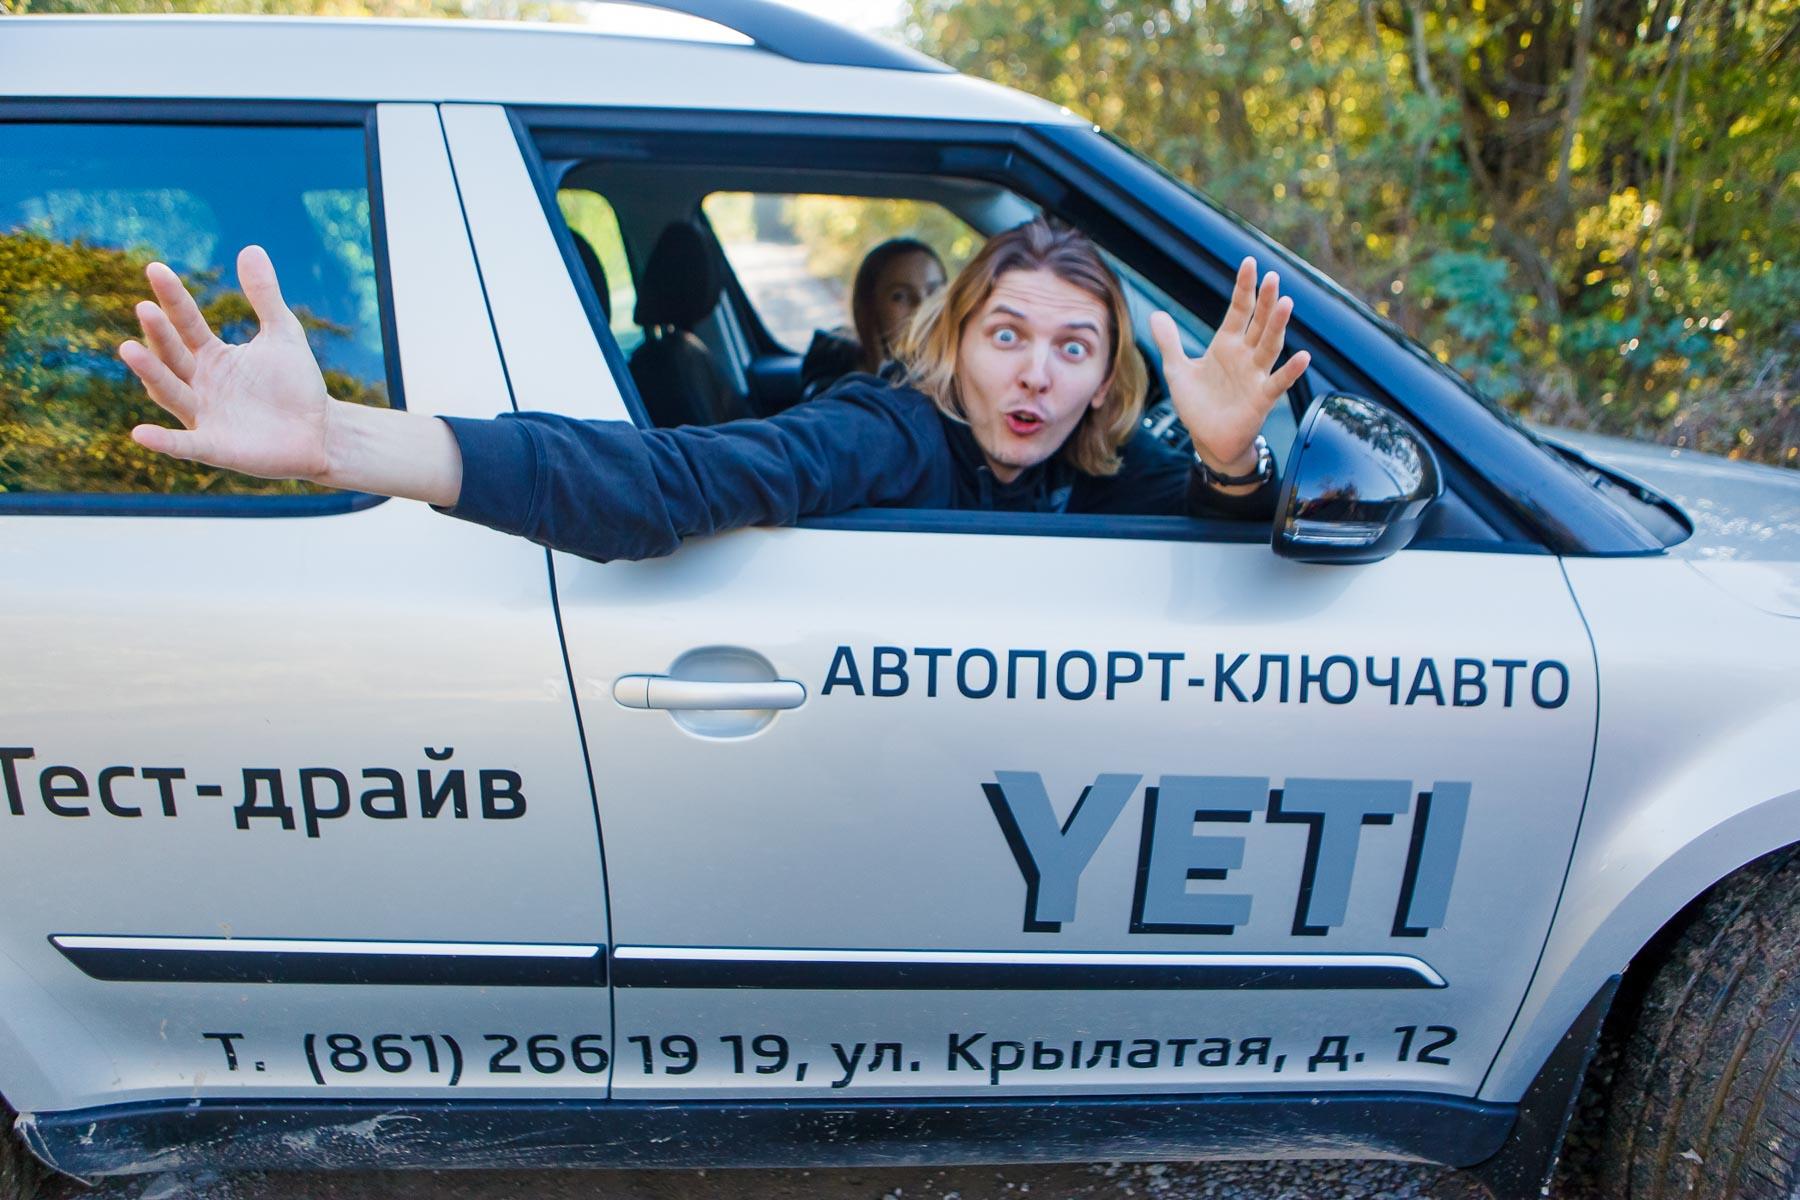 Ключавто Шкода